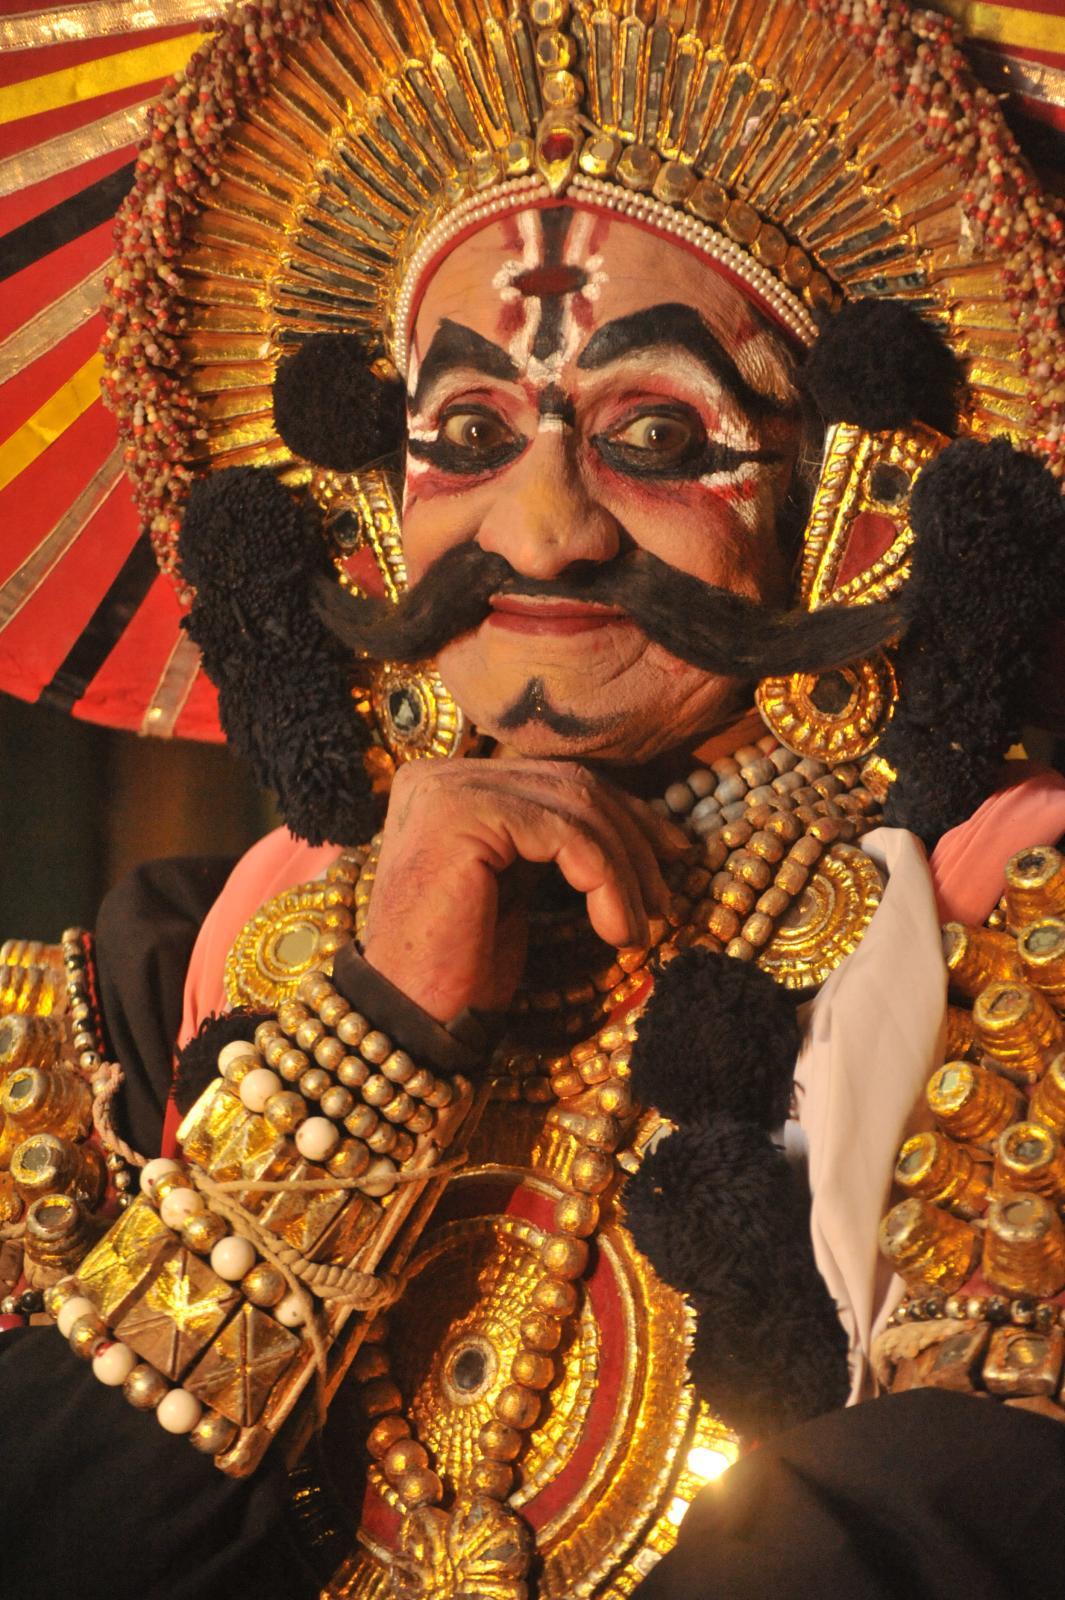 Padmashri Shri Chittani Ramachandra Hegde..at 79, still going strong